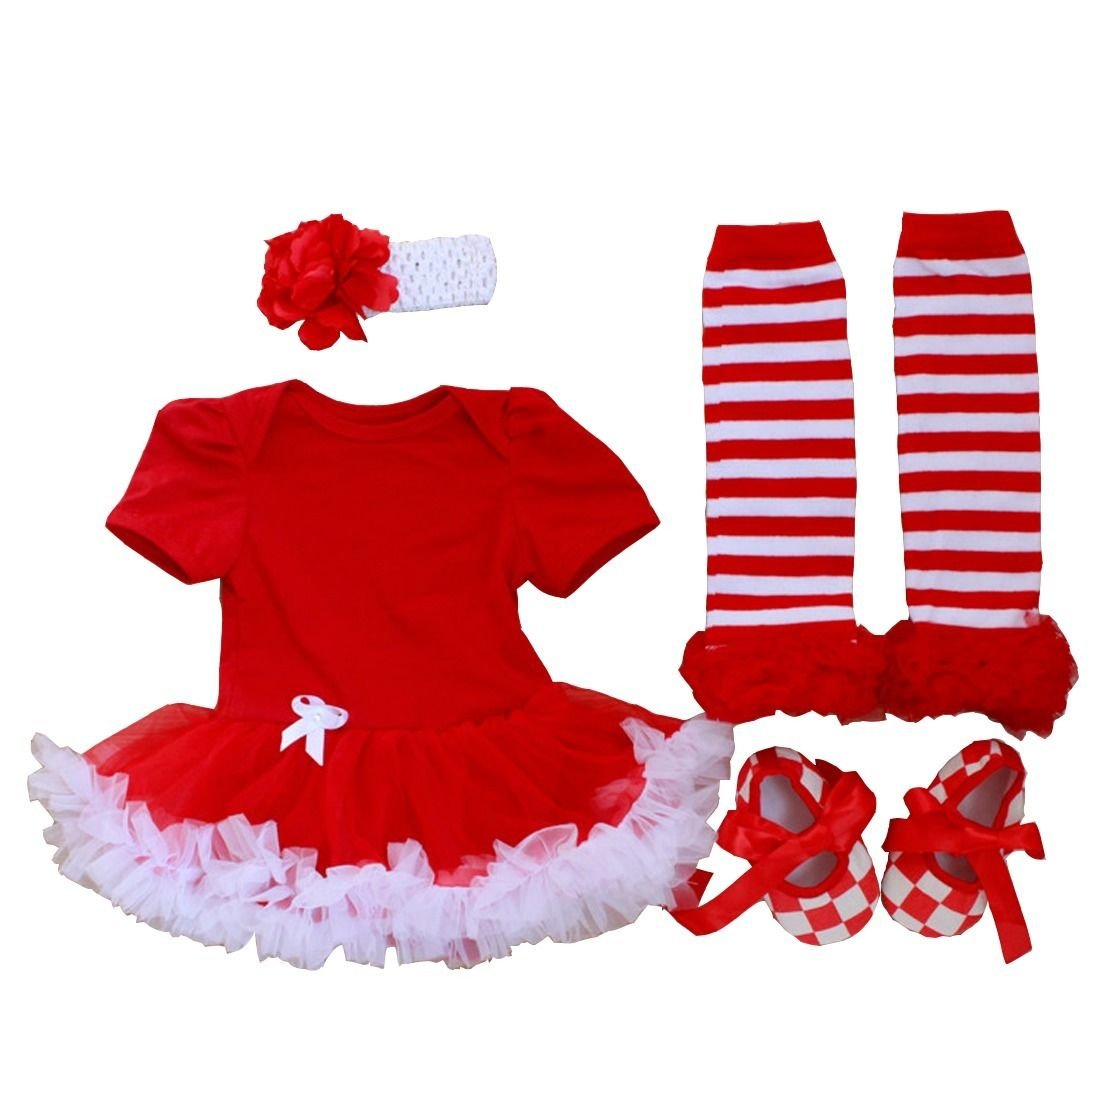 eKooBee Baby Newborn Girls Christmas Solid Romper Dress Sets Outfit